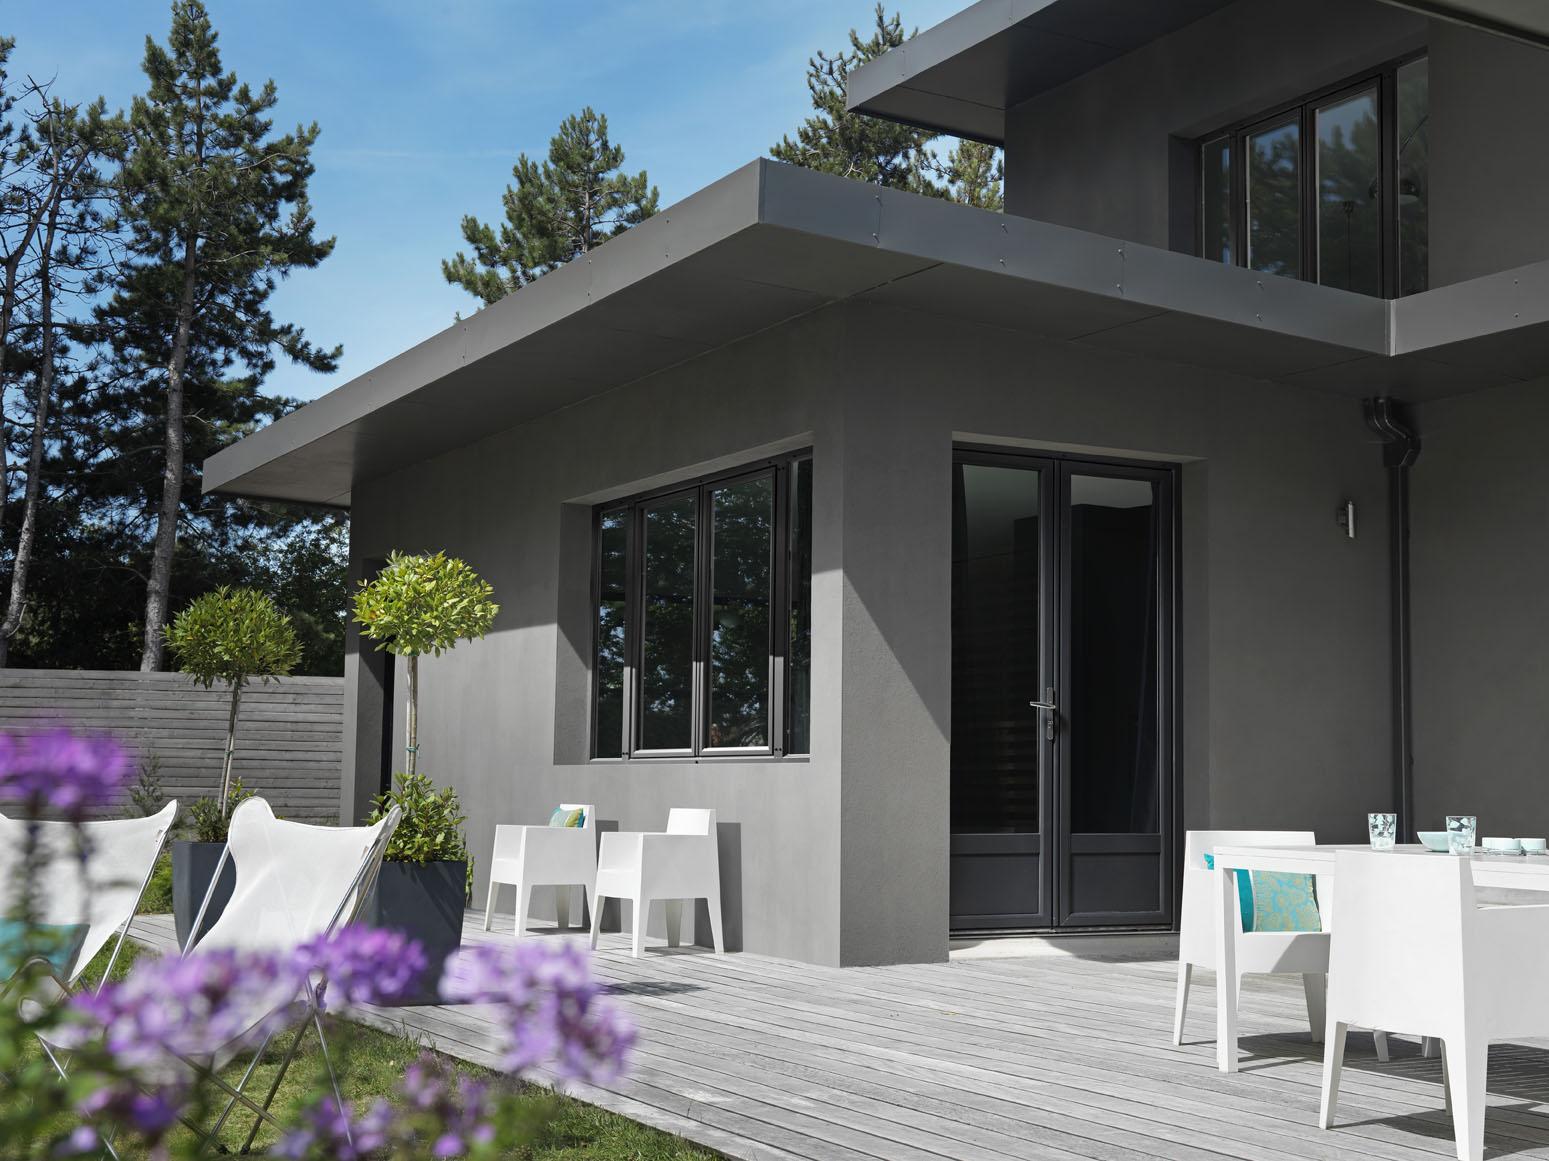 quelle fen tre choisir caroline munoz. Black Bedroom Furniture Sets. Home Design Ideas